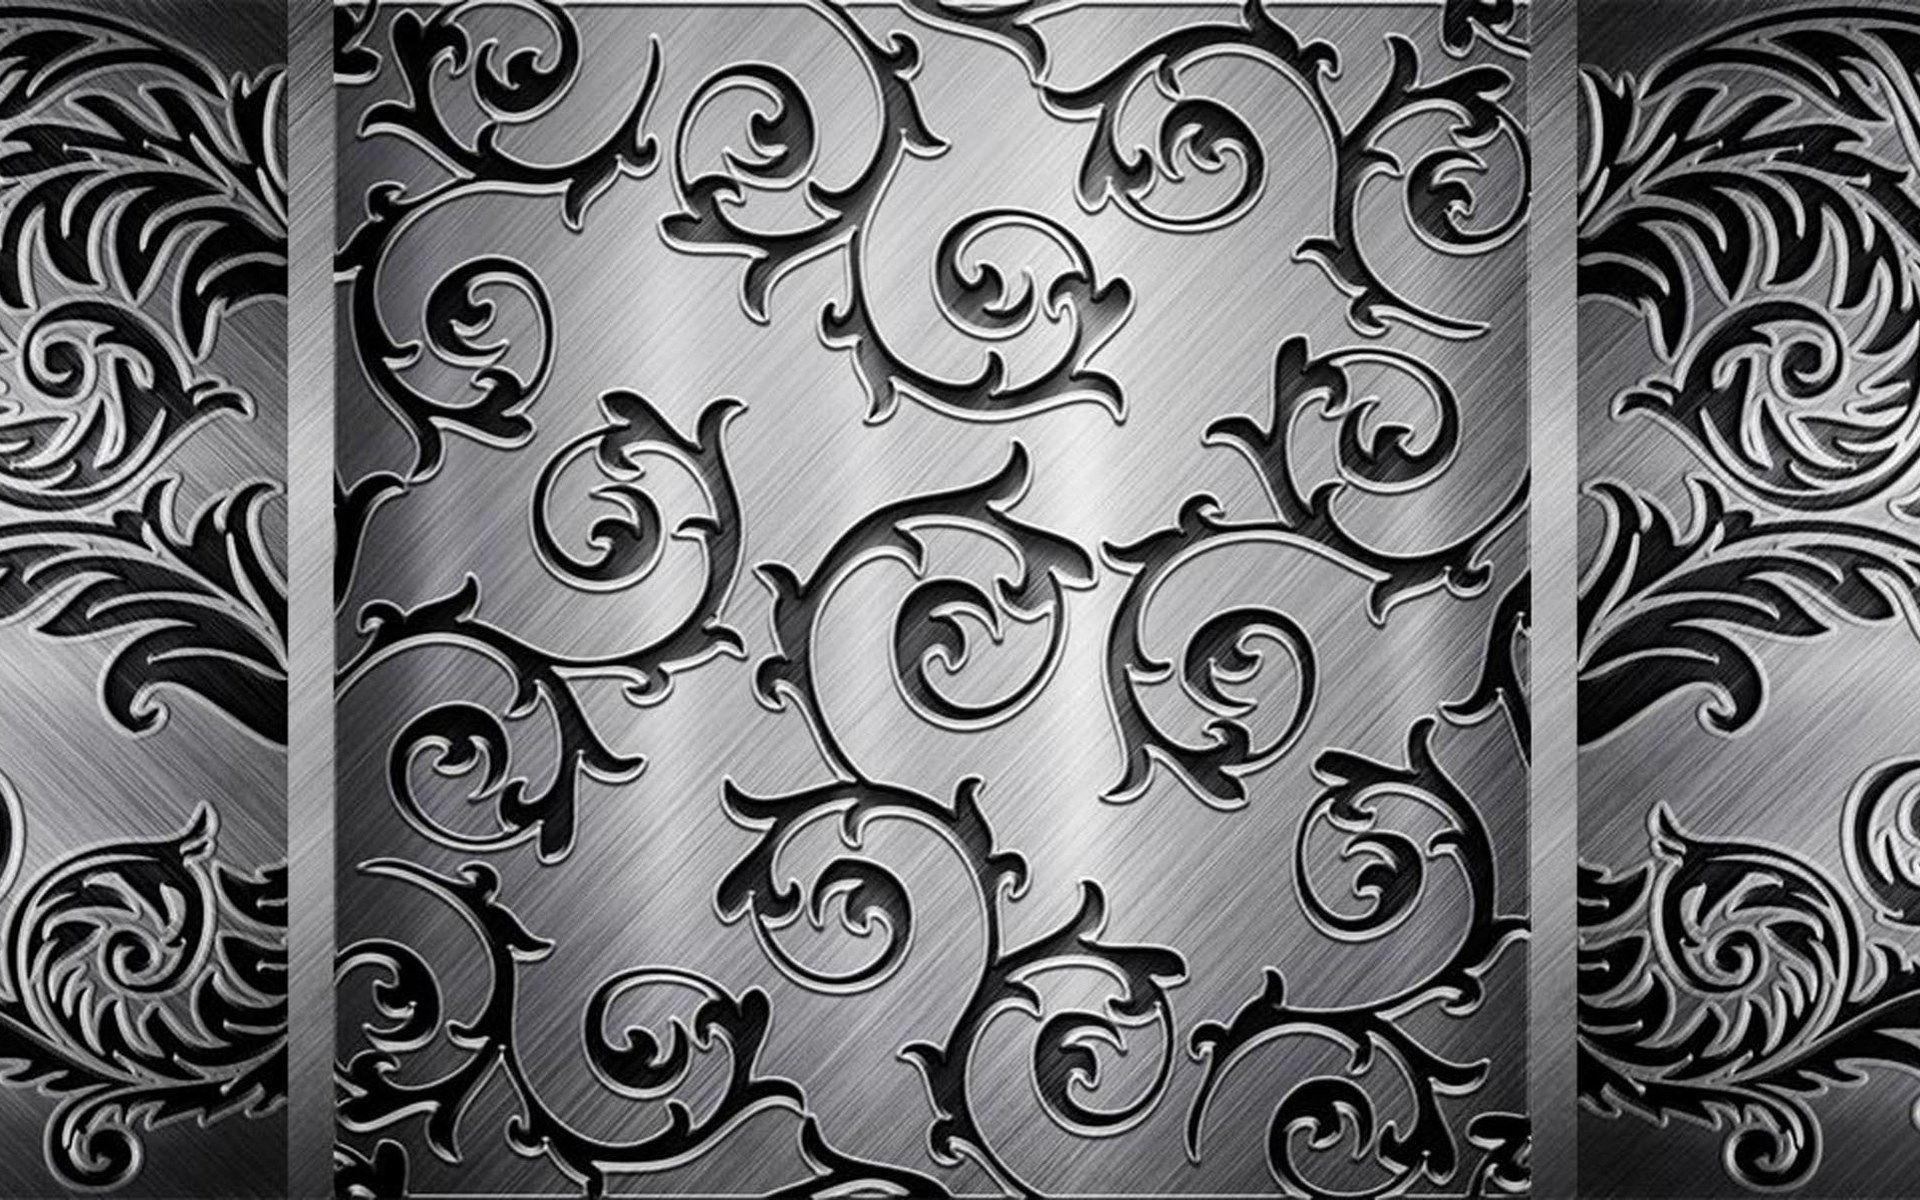 Quality Cool Metal Image 568 KB Hallstein Sinclair